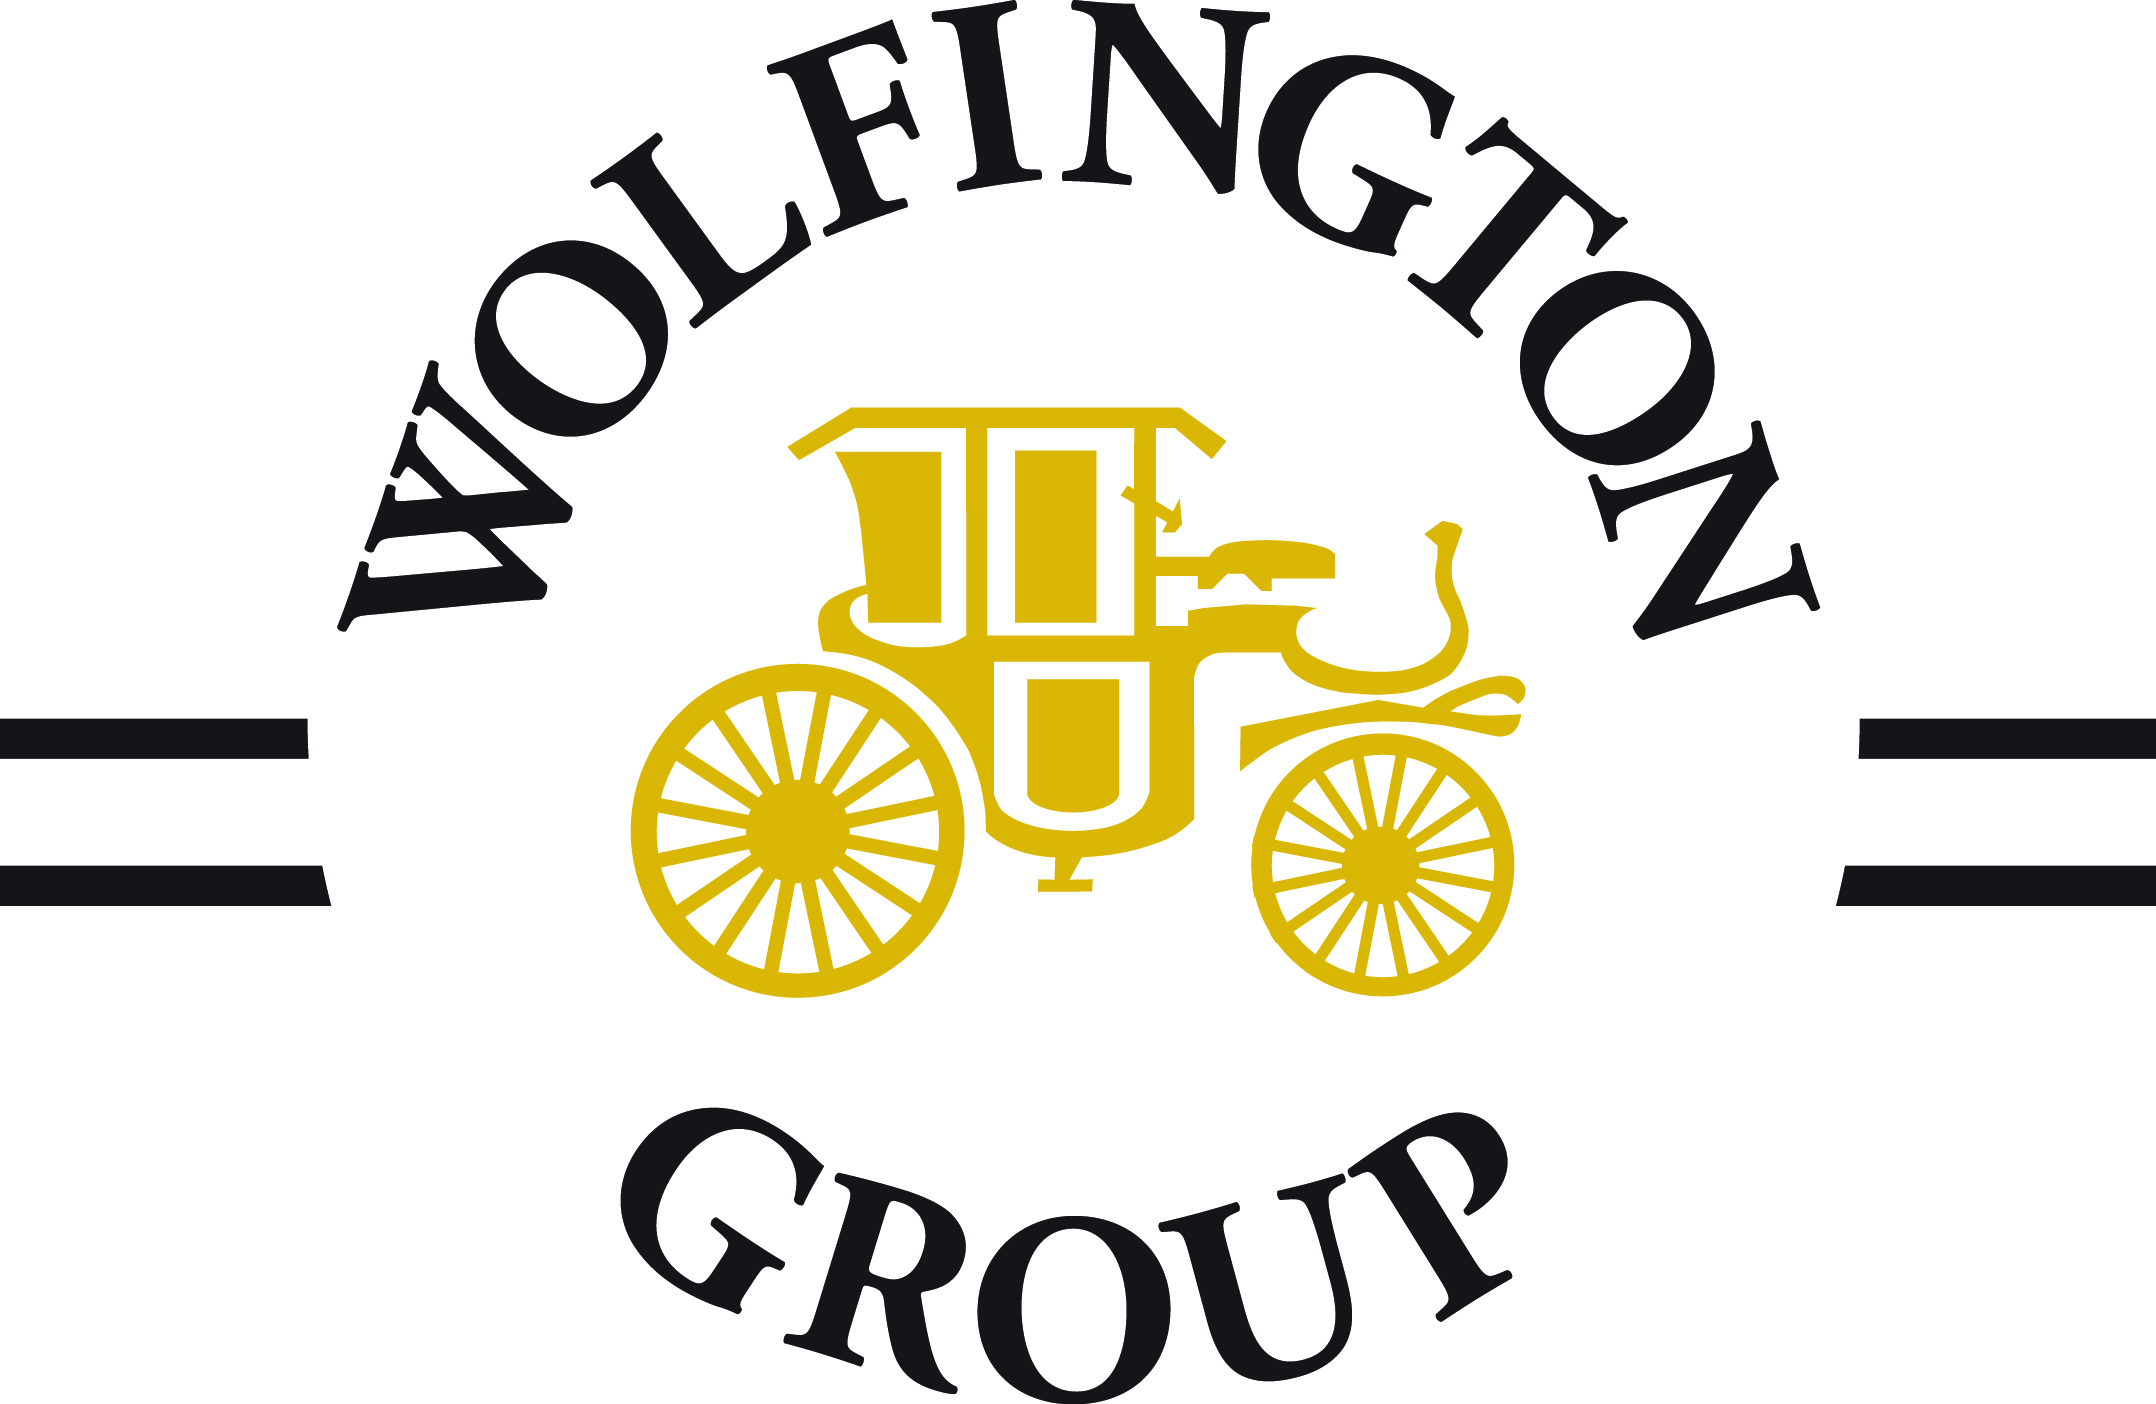 Wolfington Group logo